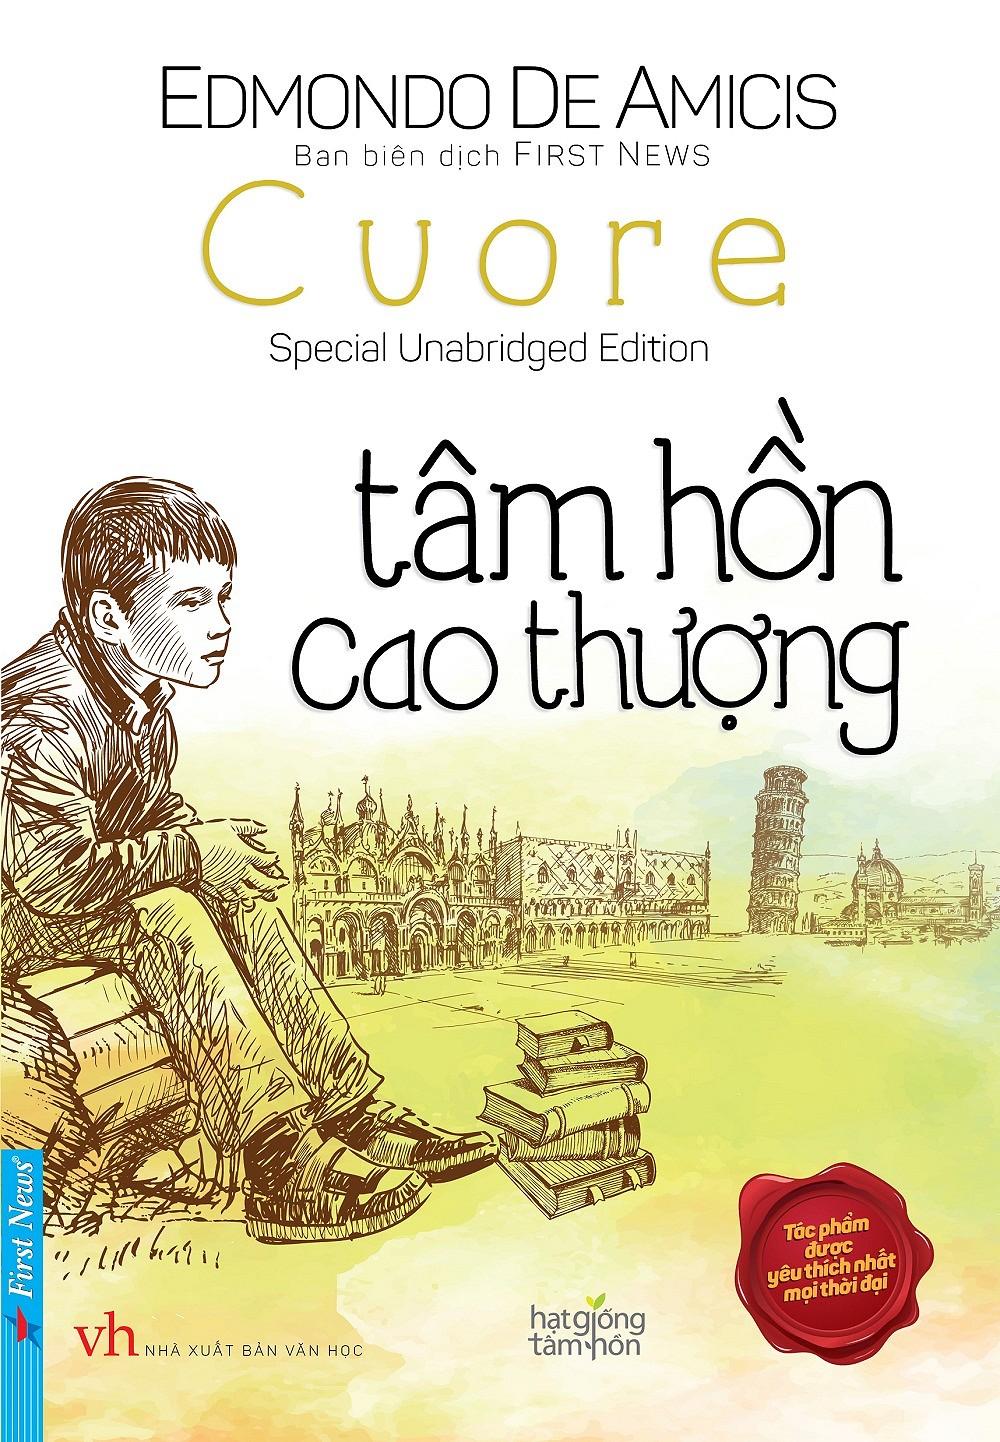 tamhoncaothuong.u547.d20170216.t104755.383446.jpg